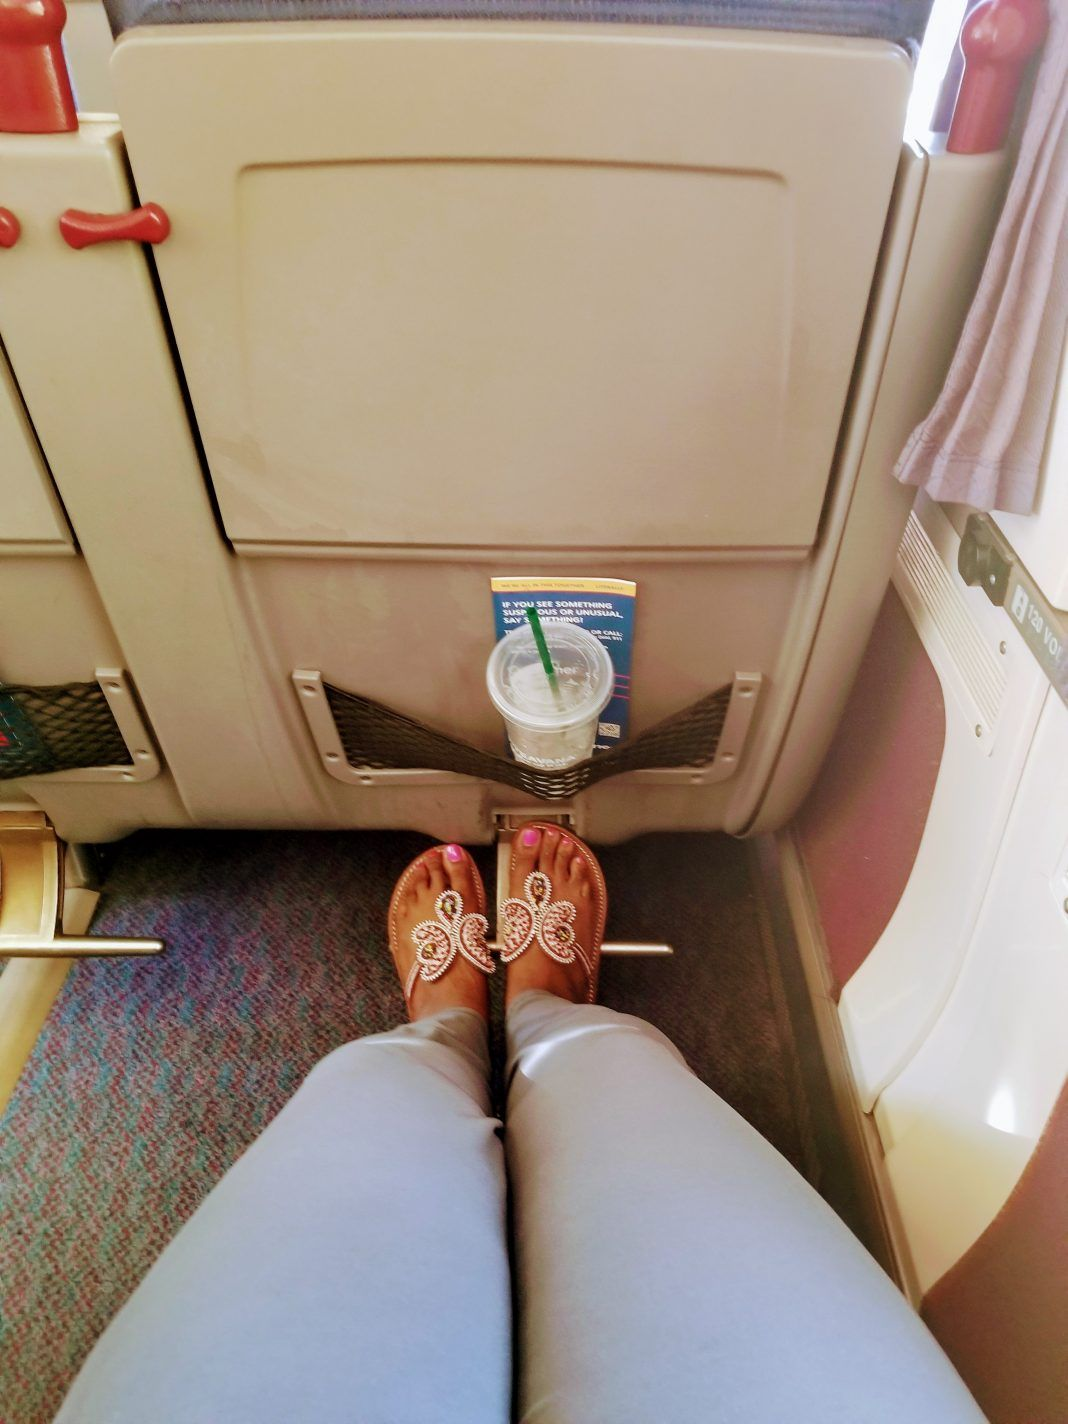 10 tips for riding Amtrak that will make traveling easier